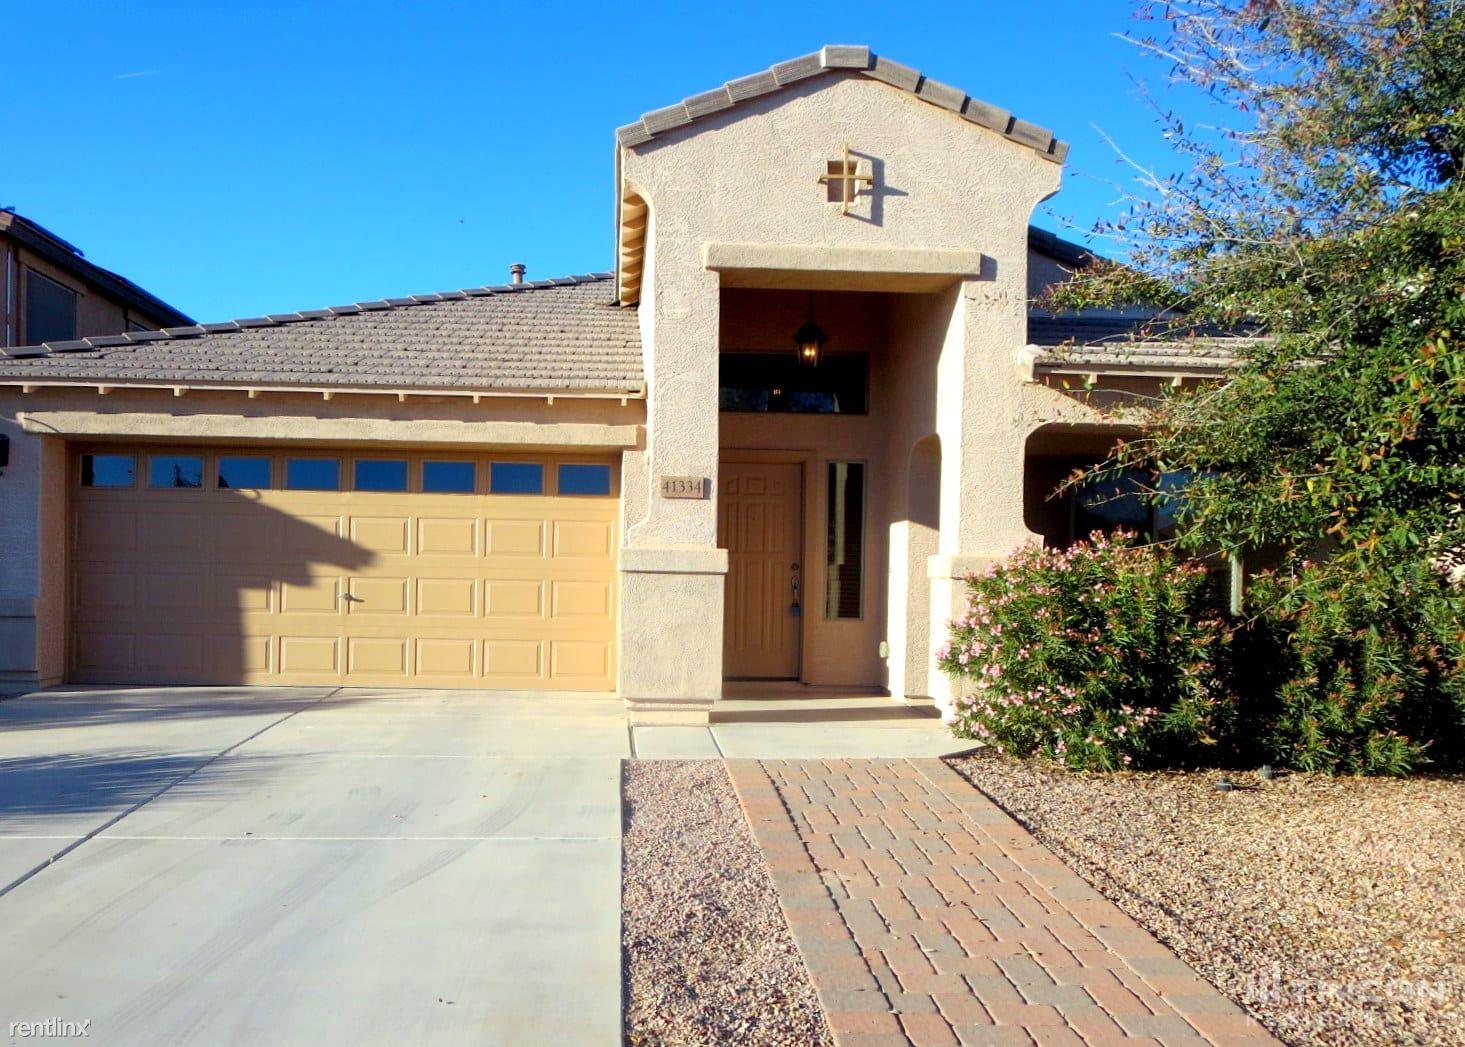 41334 W Hayden Drive, Maricopa, AZ - 1,899 USD/ month